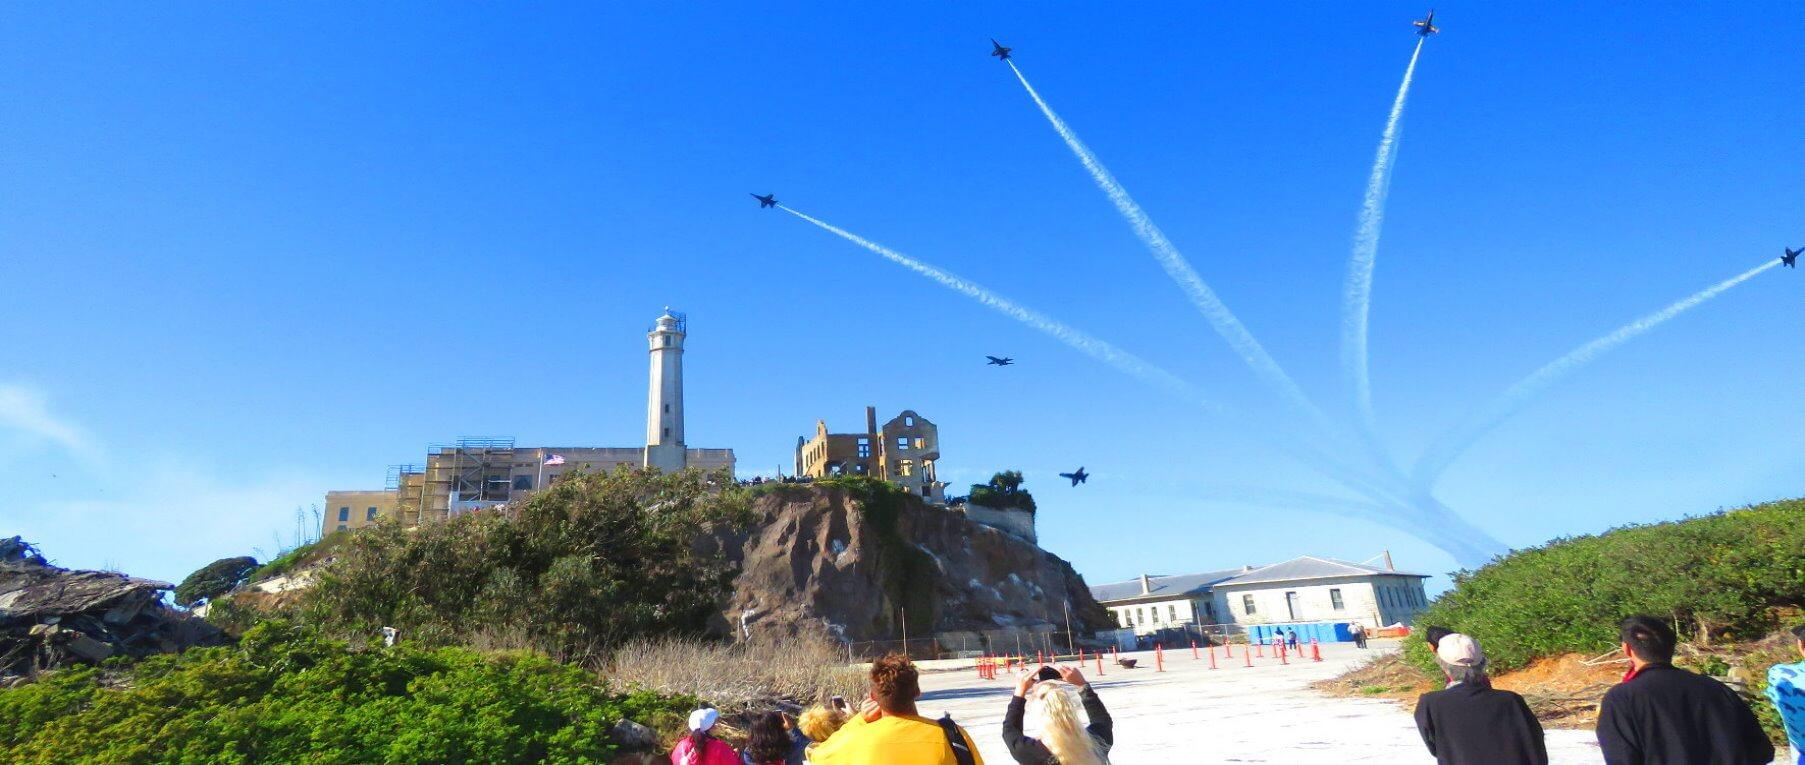 Alcatraz-Island-Prison-Tours-Ticketsisland-outside-court-gardens